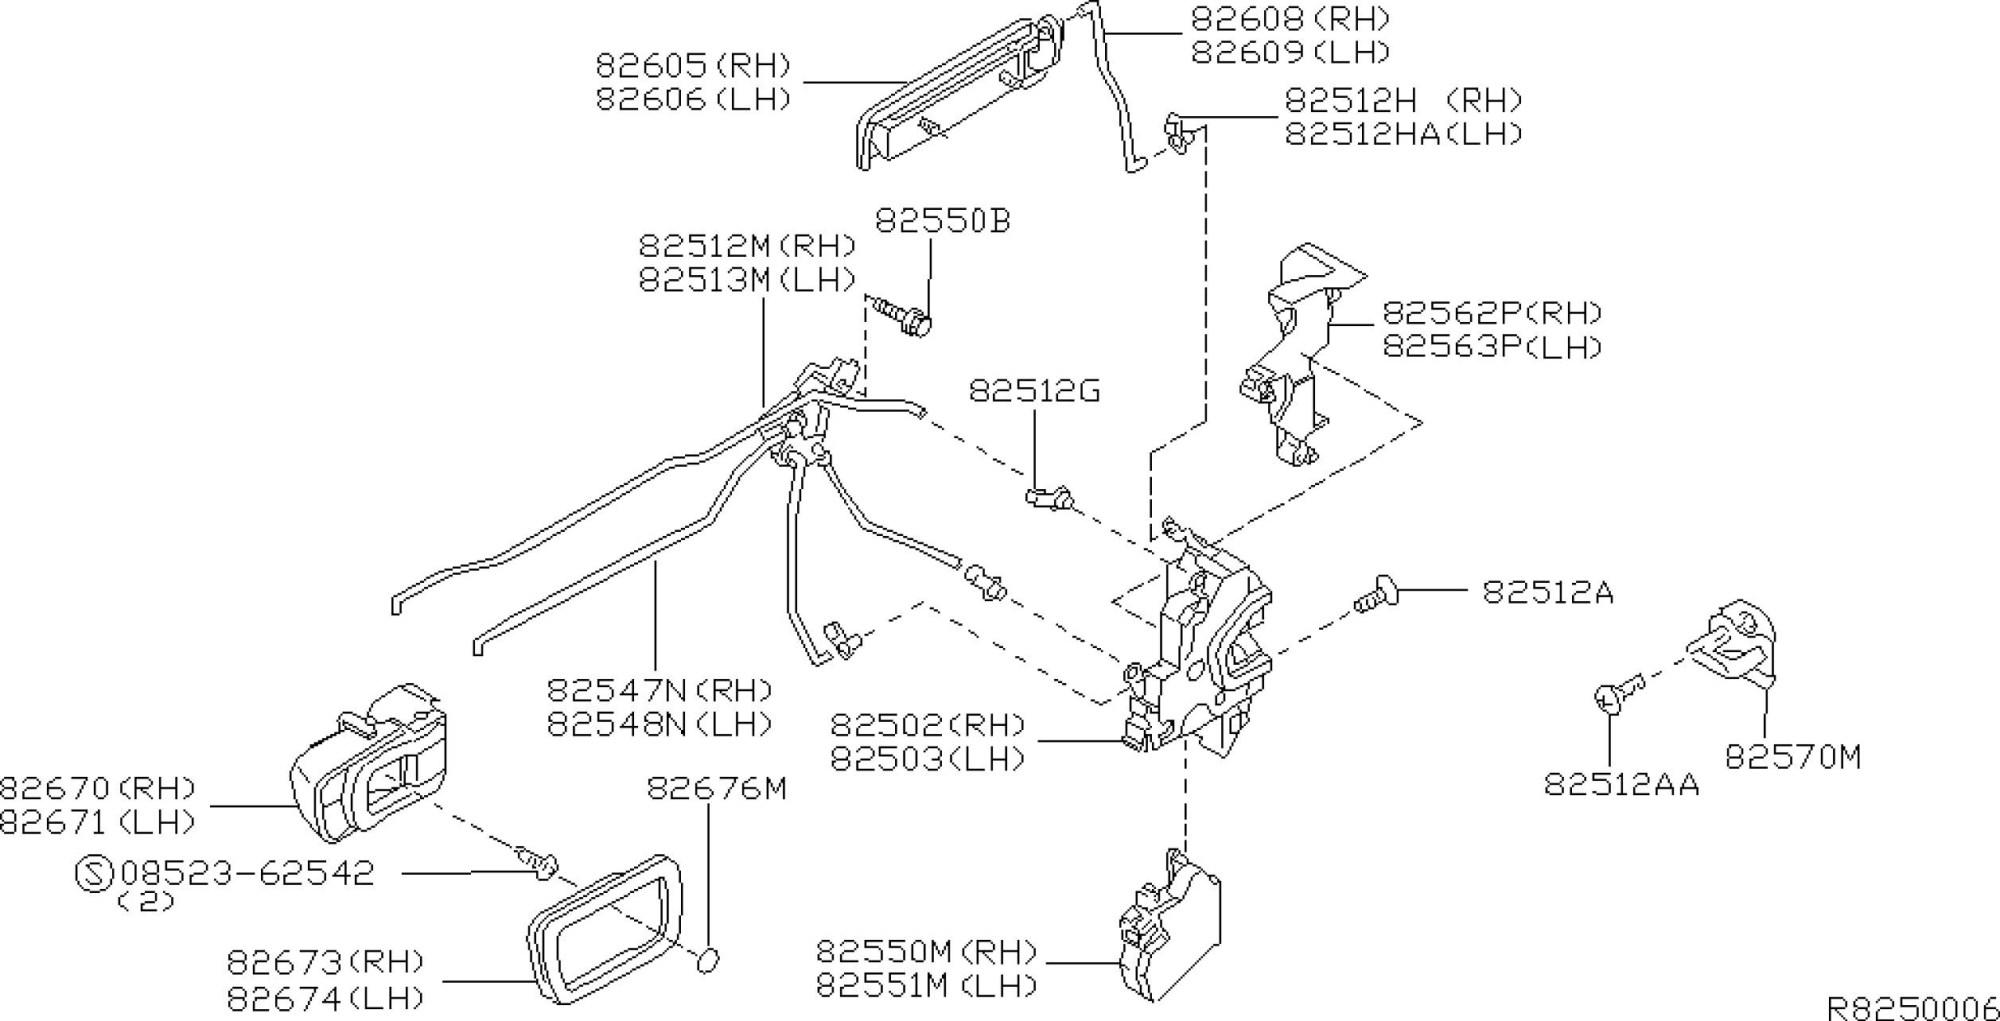 hight resolution of 2006 nissan pathfinder engine diagram wiring diagram mega 2006 nissan pathfinder engine diagram